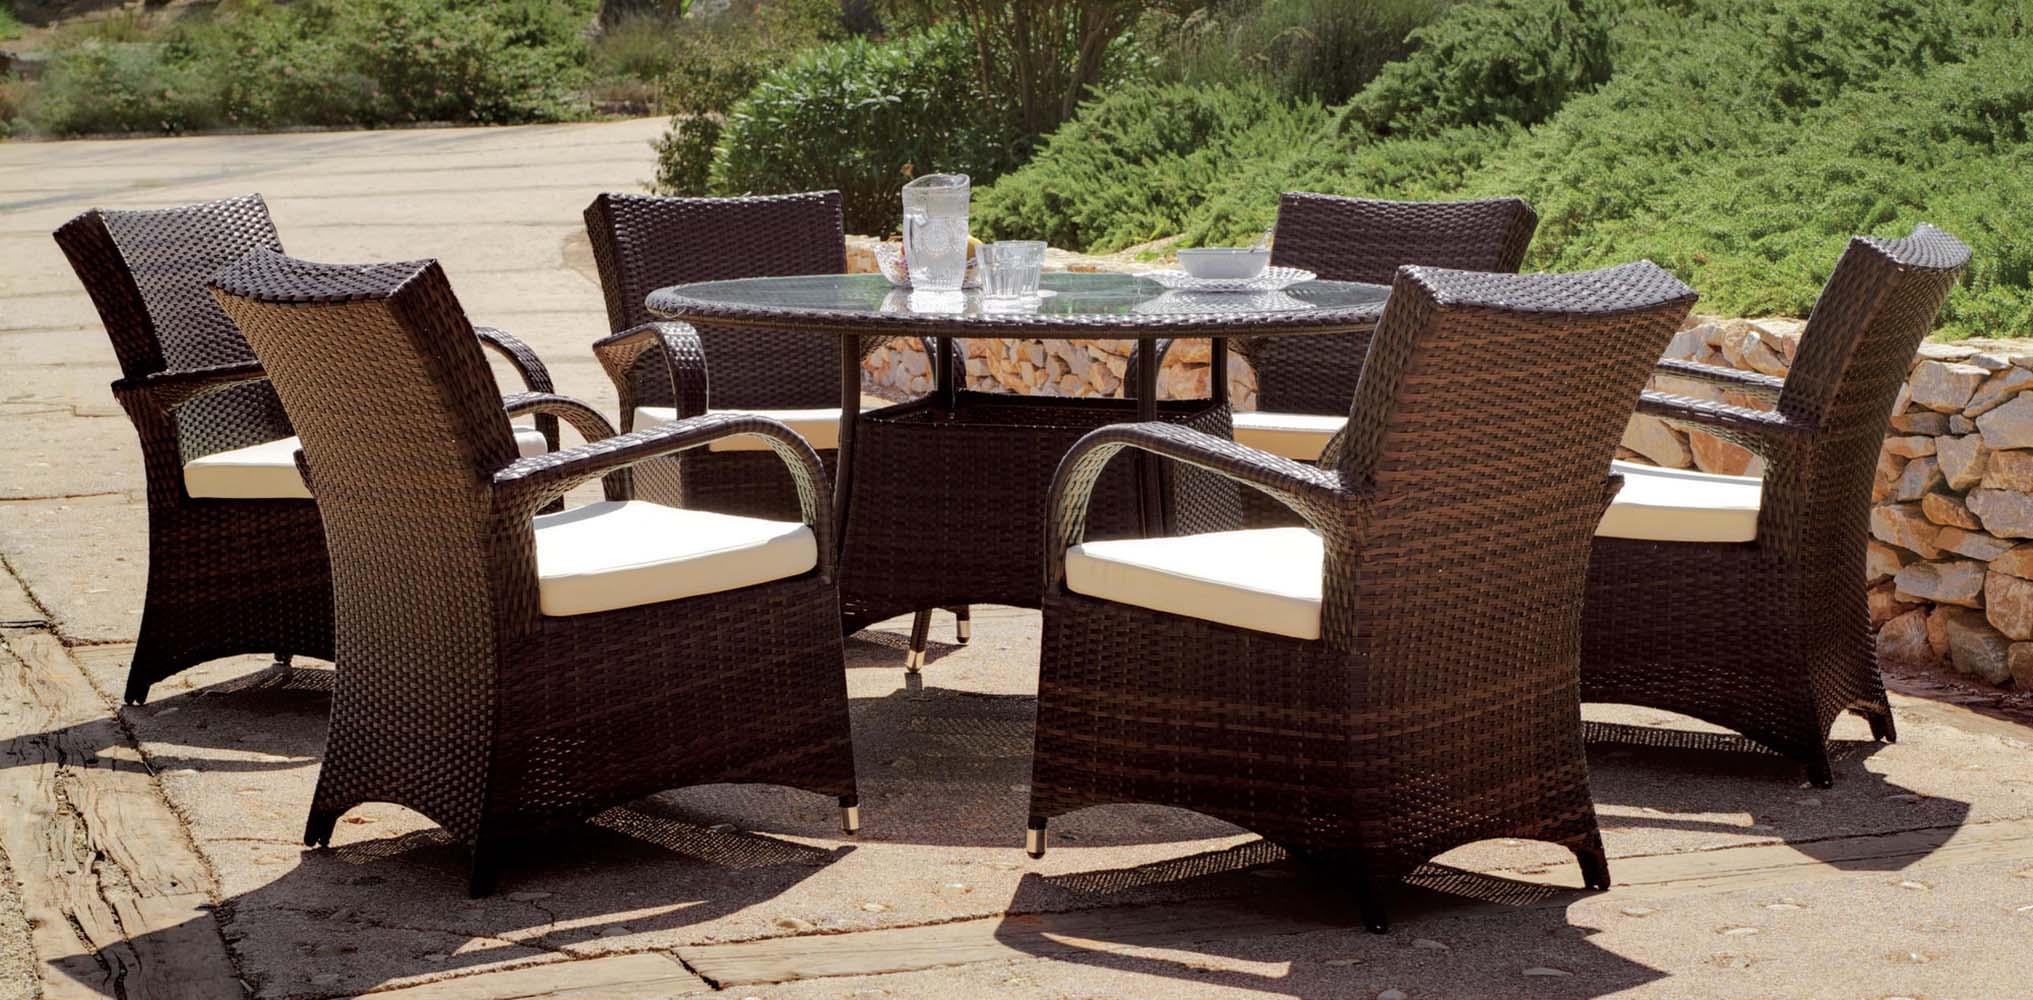 salon de jardin 6 personnes oregon. Black Bedroom Furniture Sets. Home Design Ideas